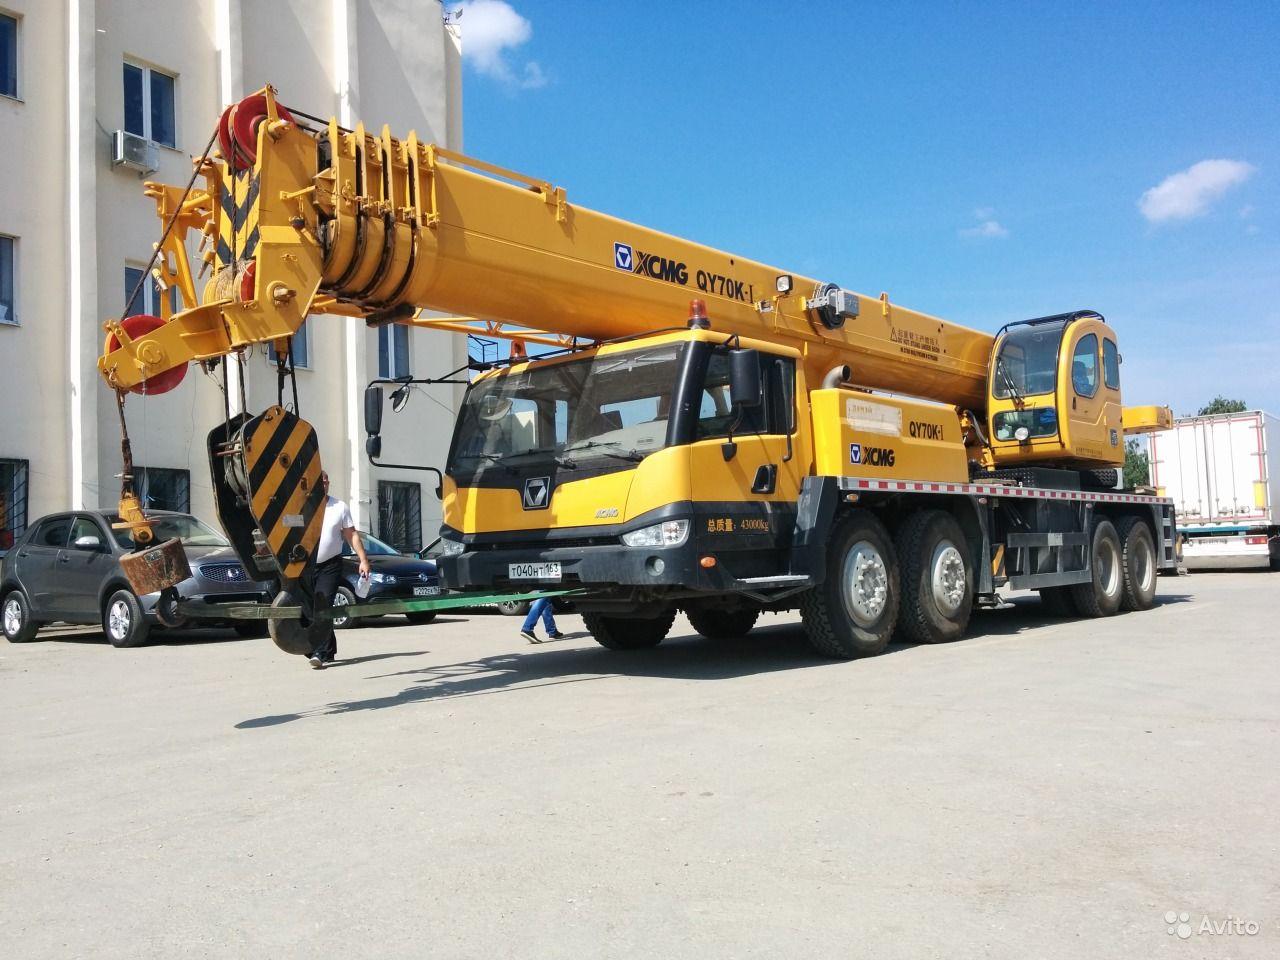 Автокраны грузоподъемностью от 40 до 200 тонн